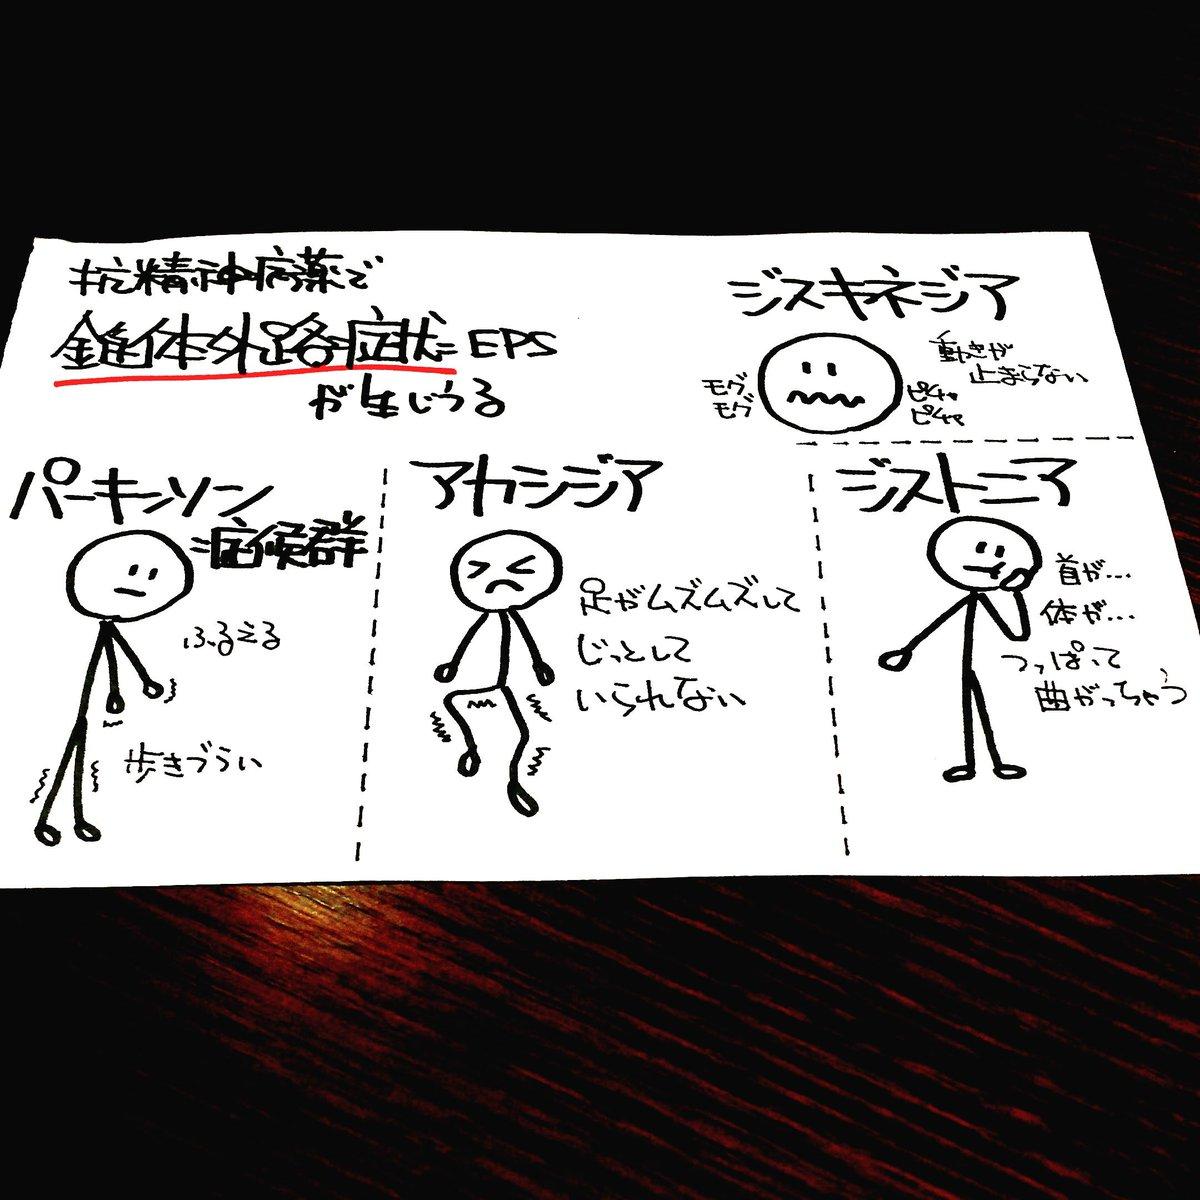 "টুইটারে 精神科医 ぷしこノート: ""抗精神病薬の副作用のひとつ ..."